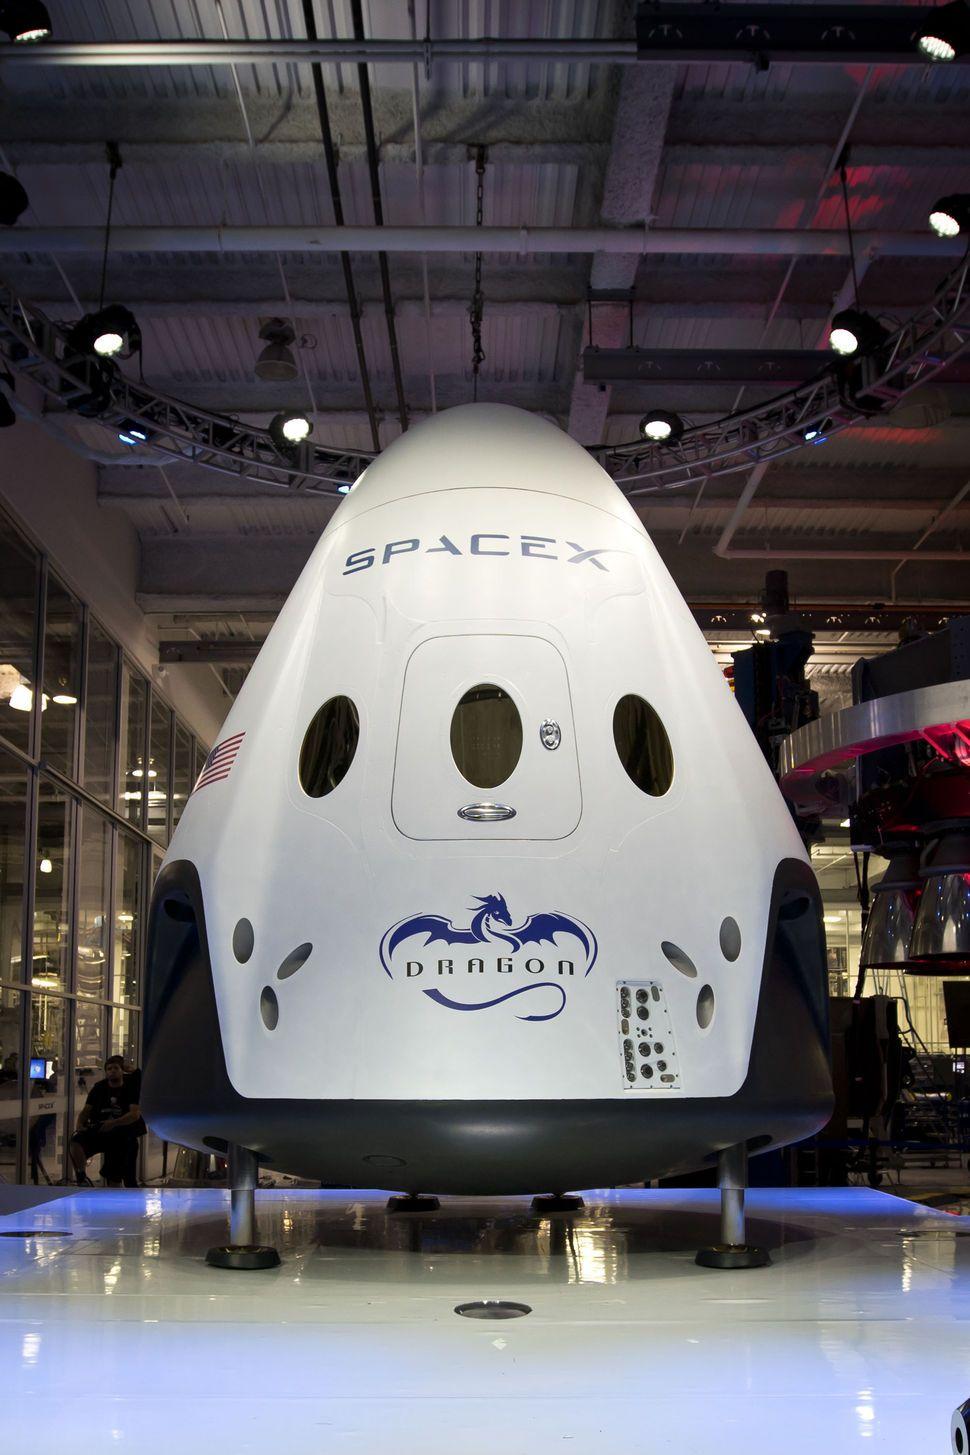 Enter The Dragon V2 Space X S Seven Passenger Spacecraft